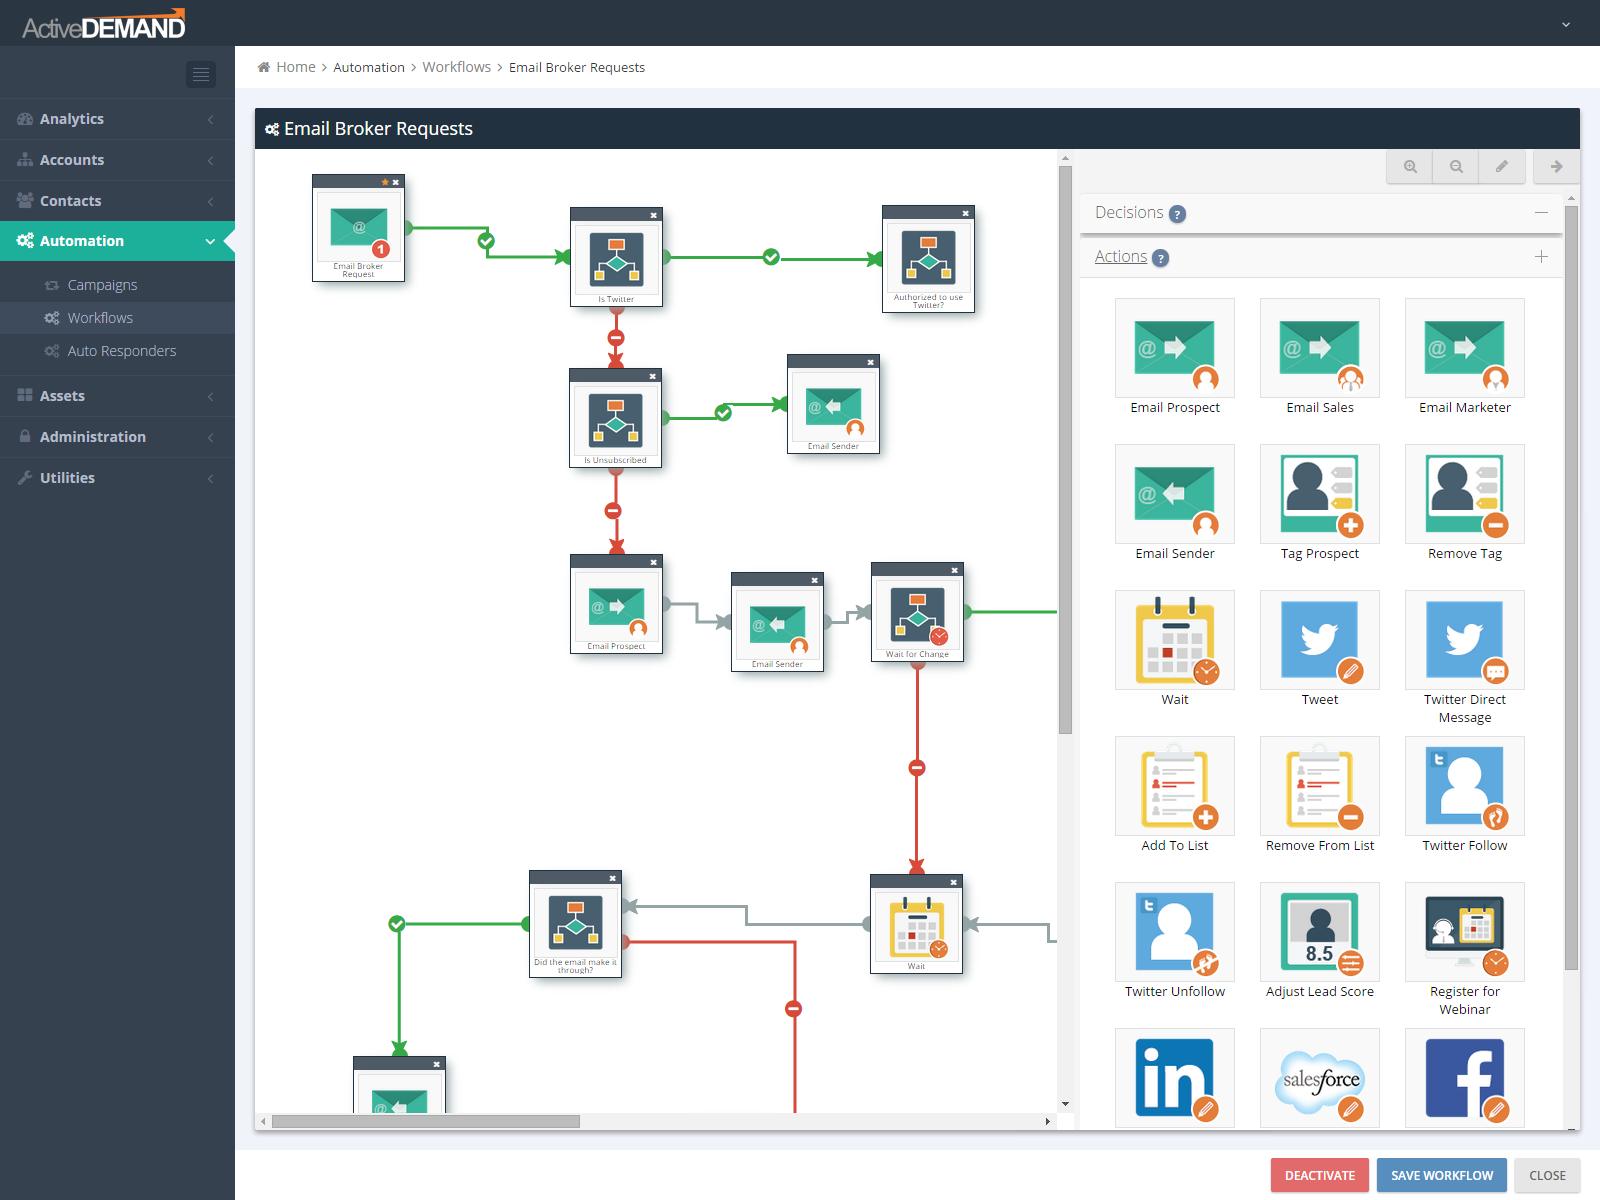 ActiveDEMAND Software - ActiveDEMAND email broker requests